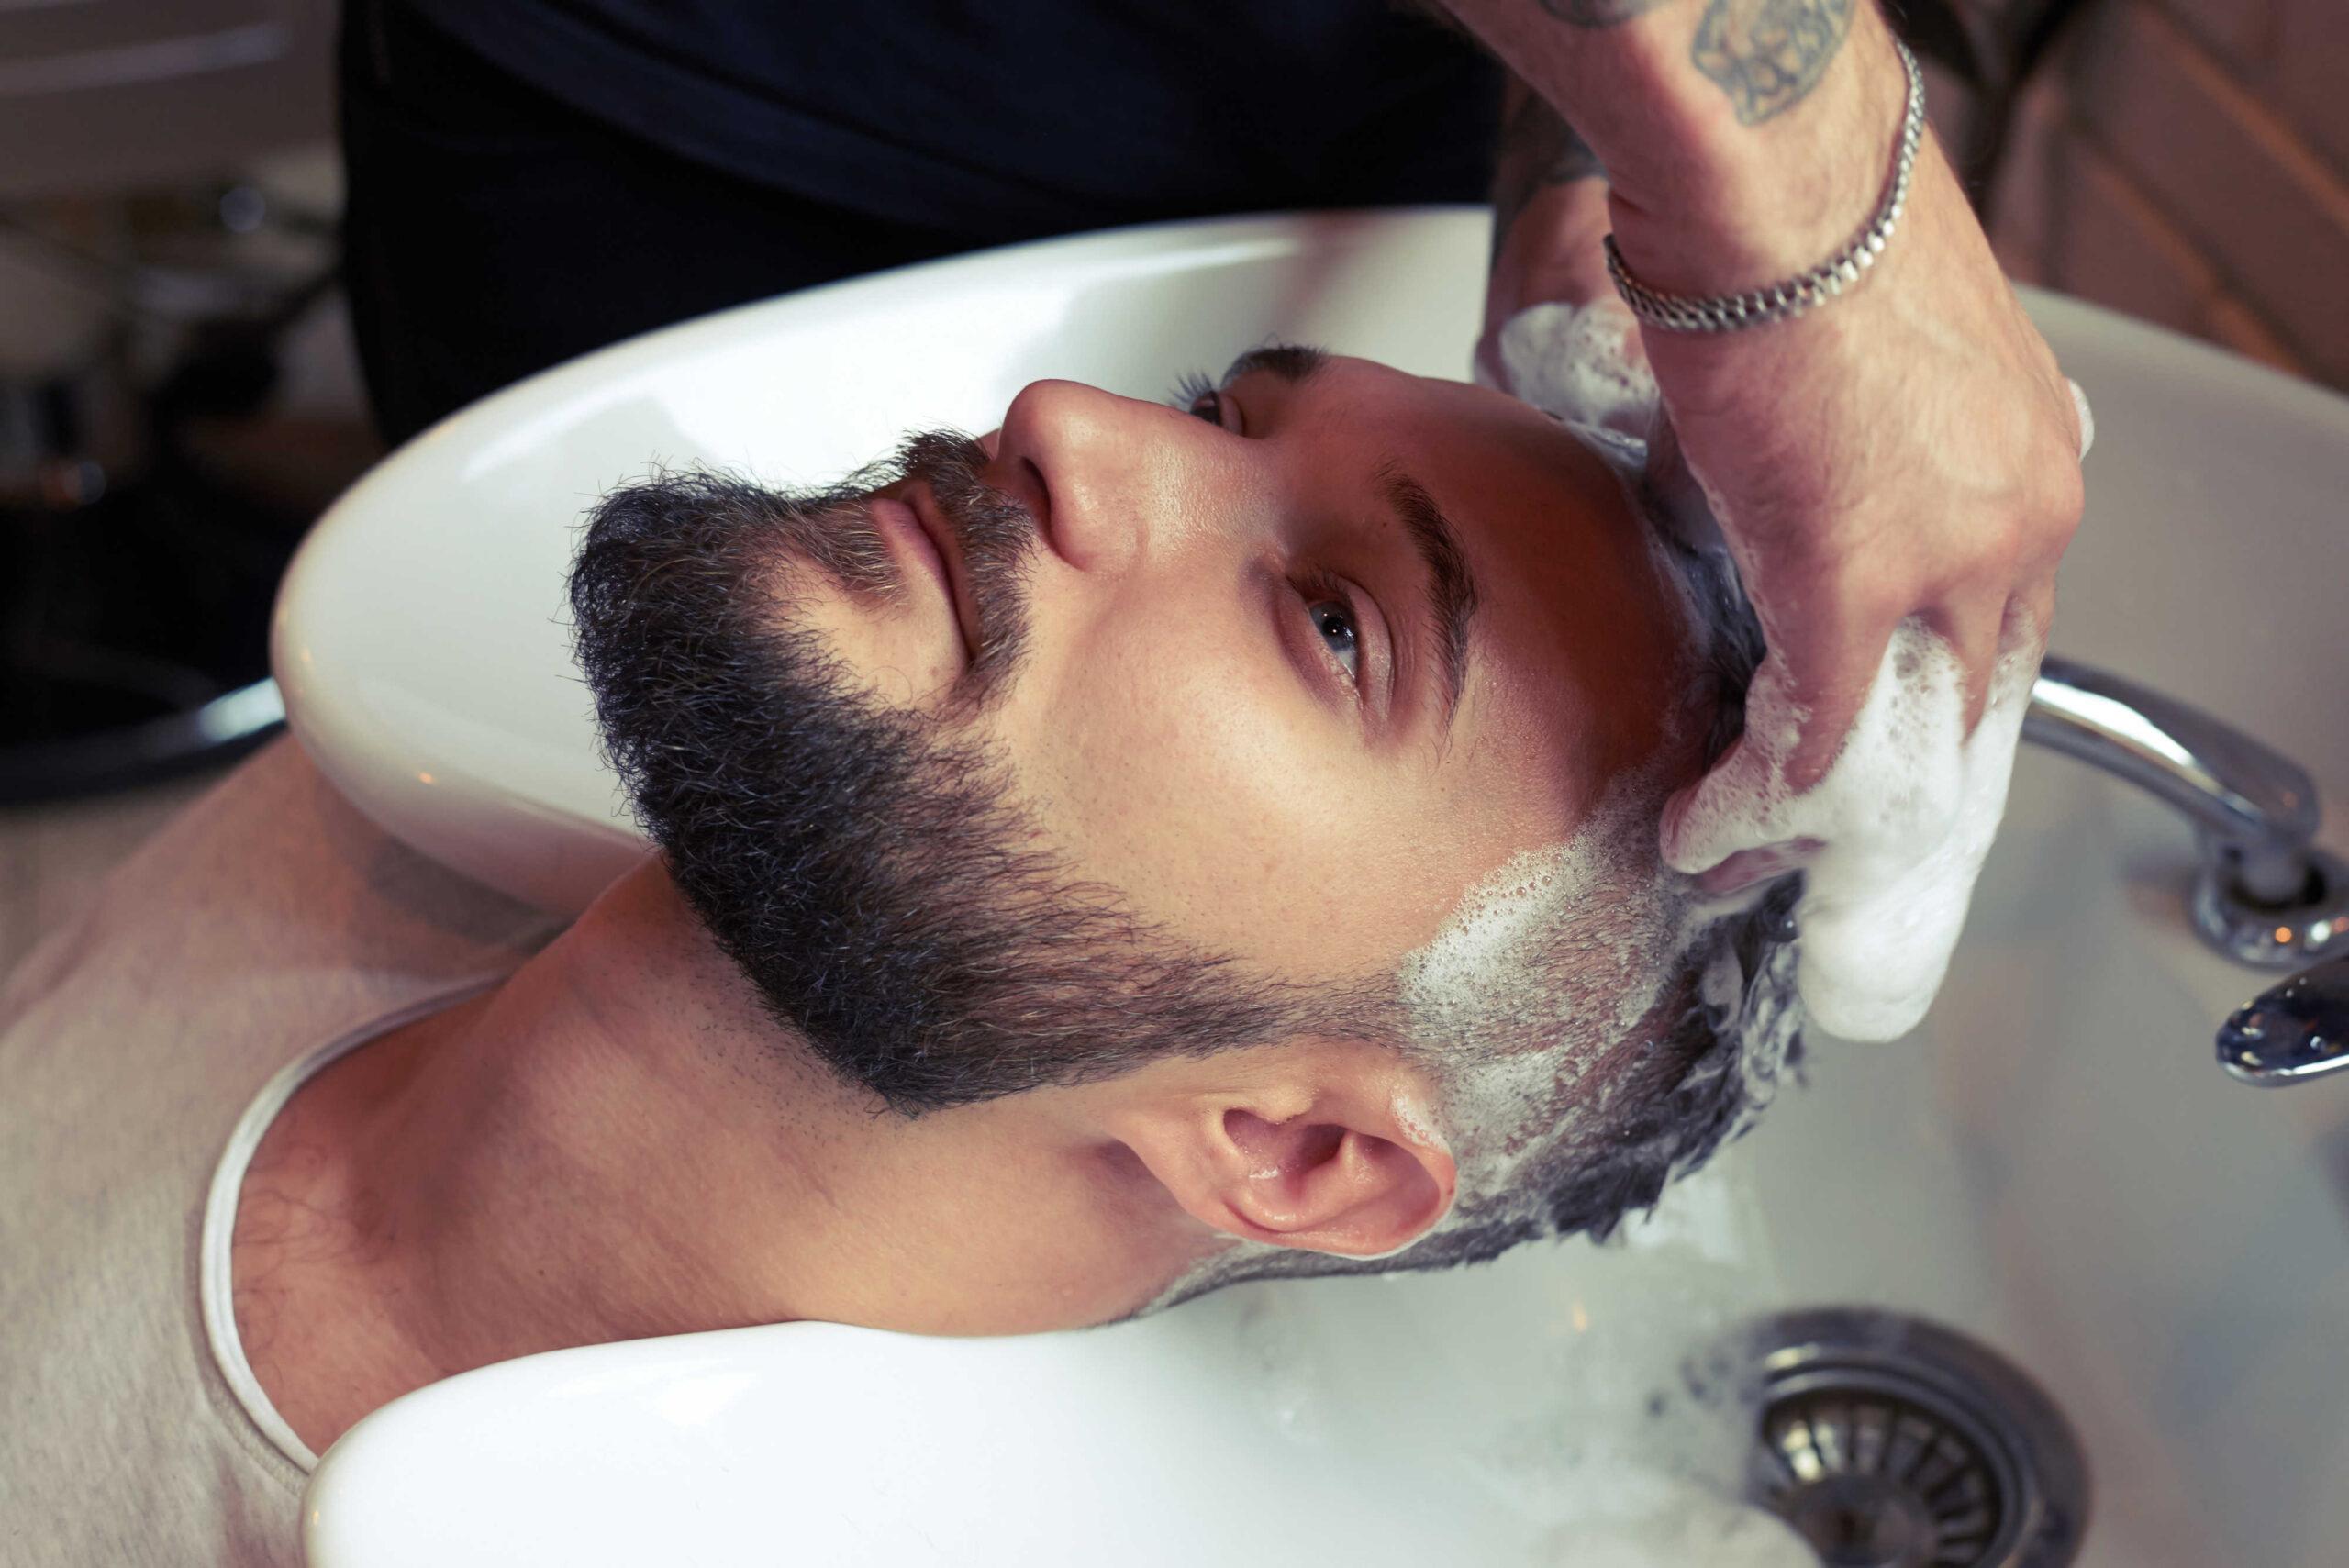 Как часто необходимо мыть голову мужчинам